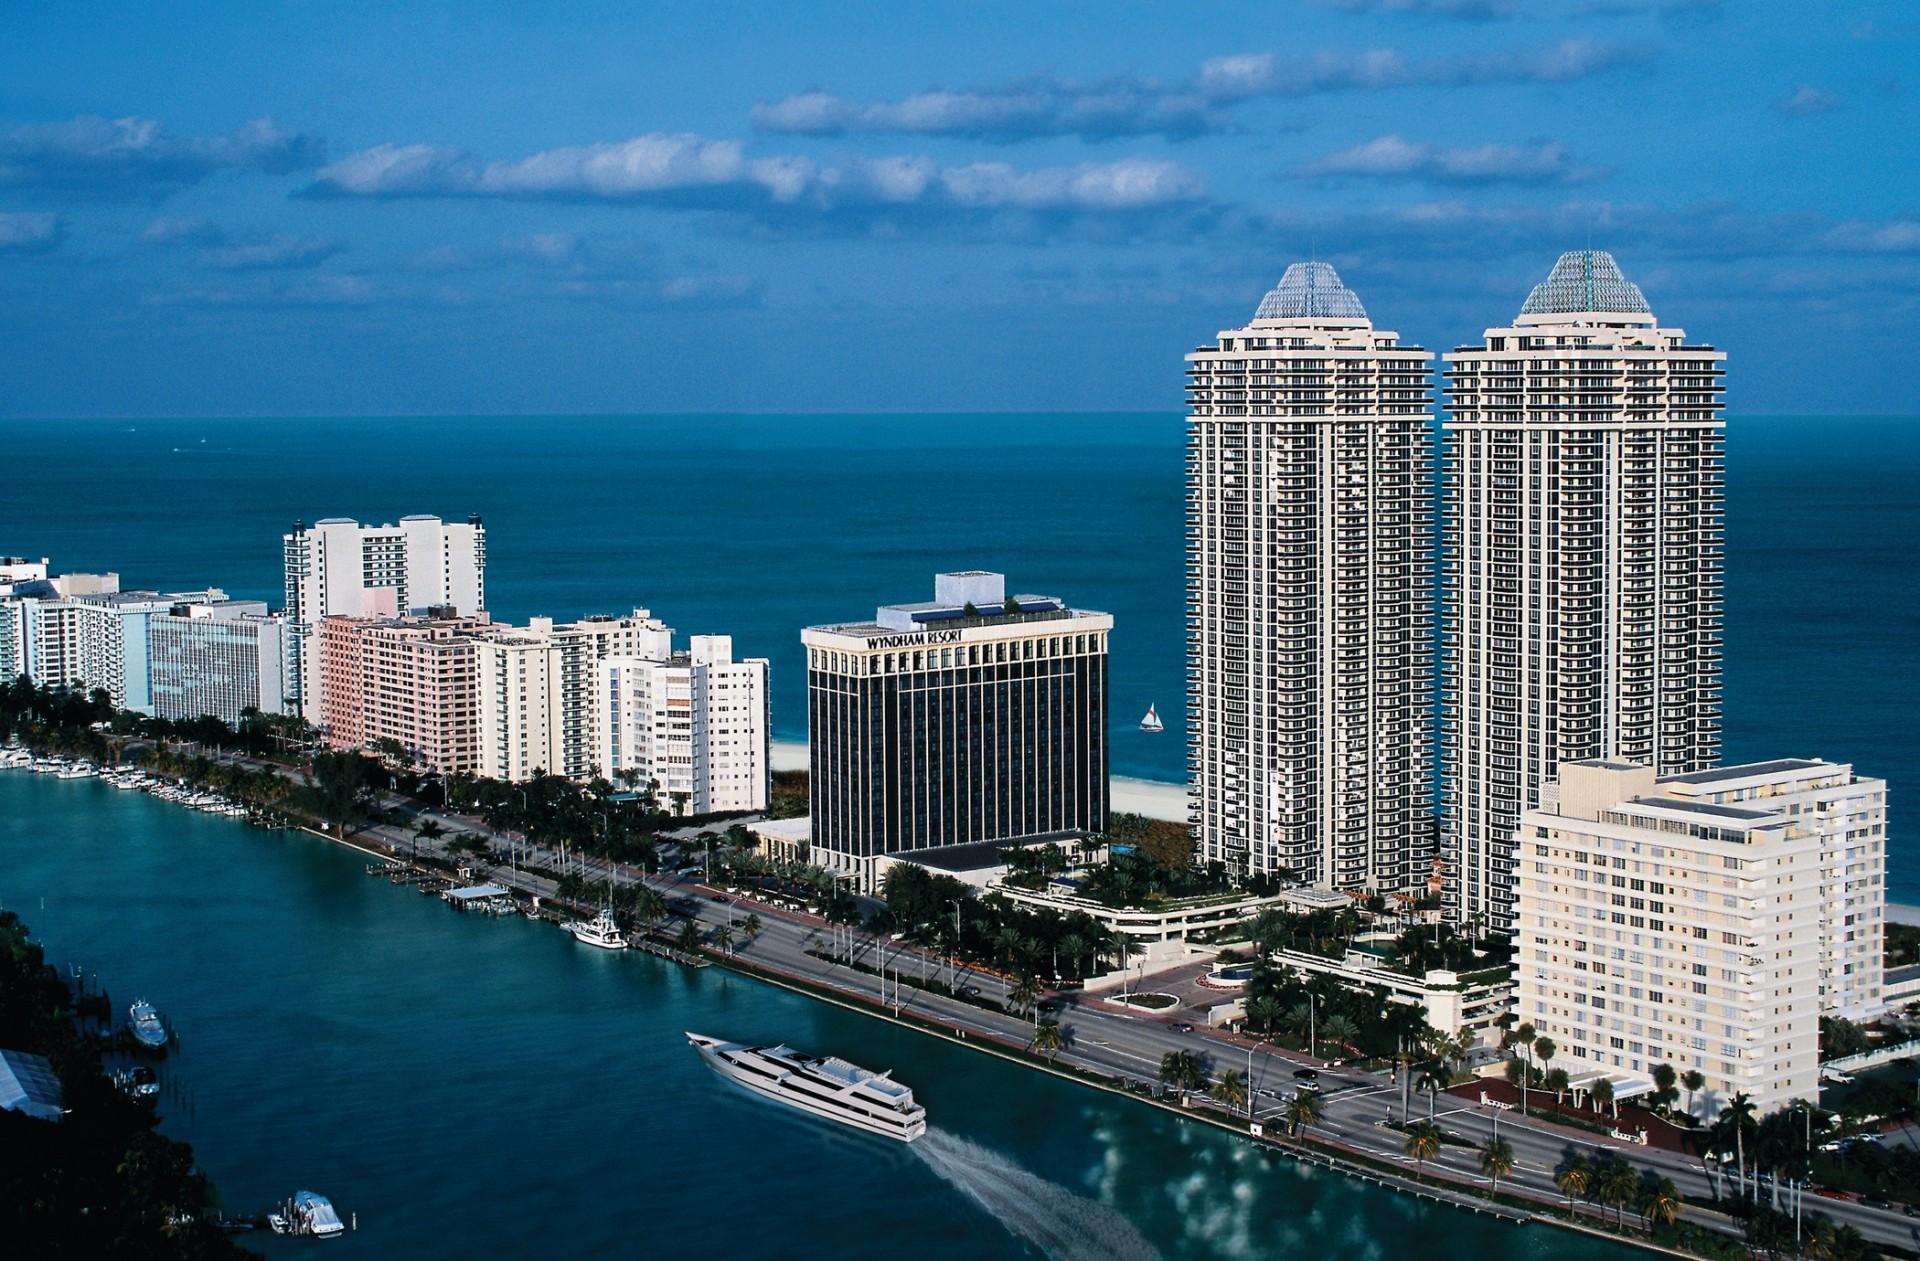 Beach Resort in Miami HD Wallpaper 1920x1261